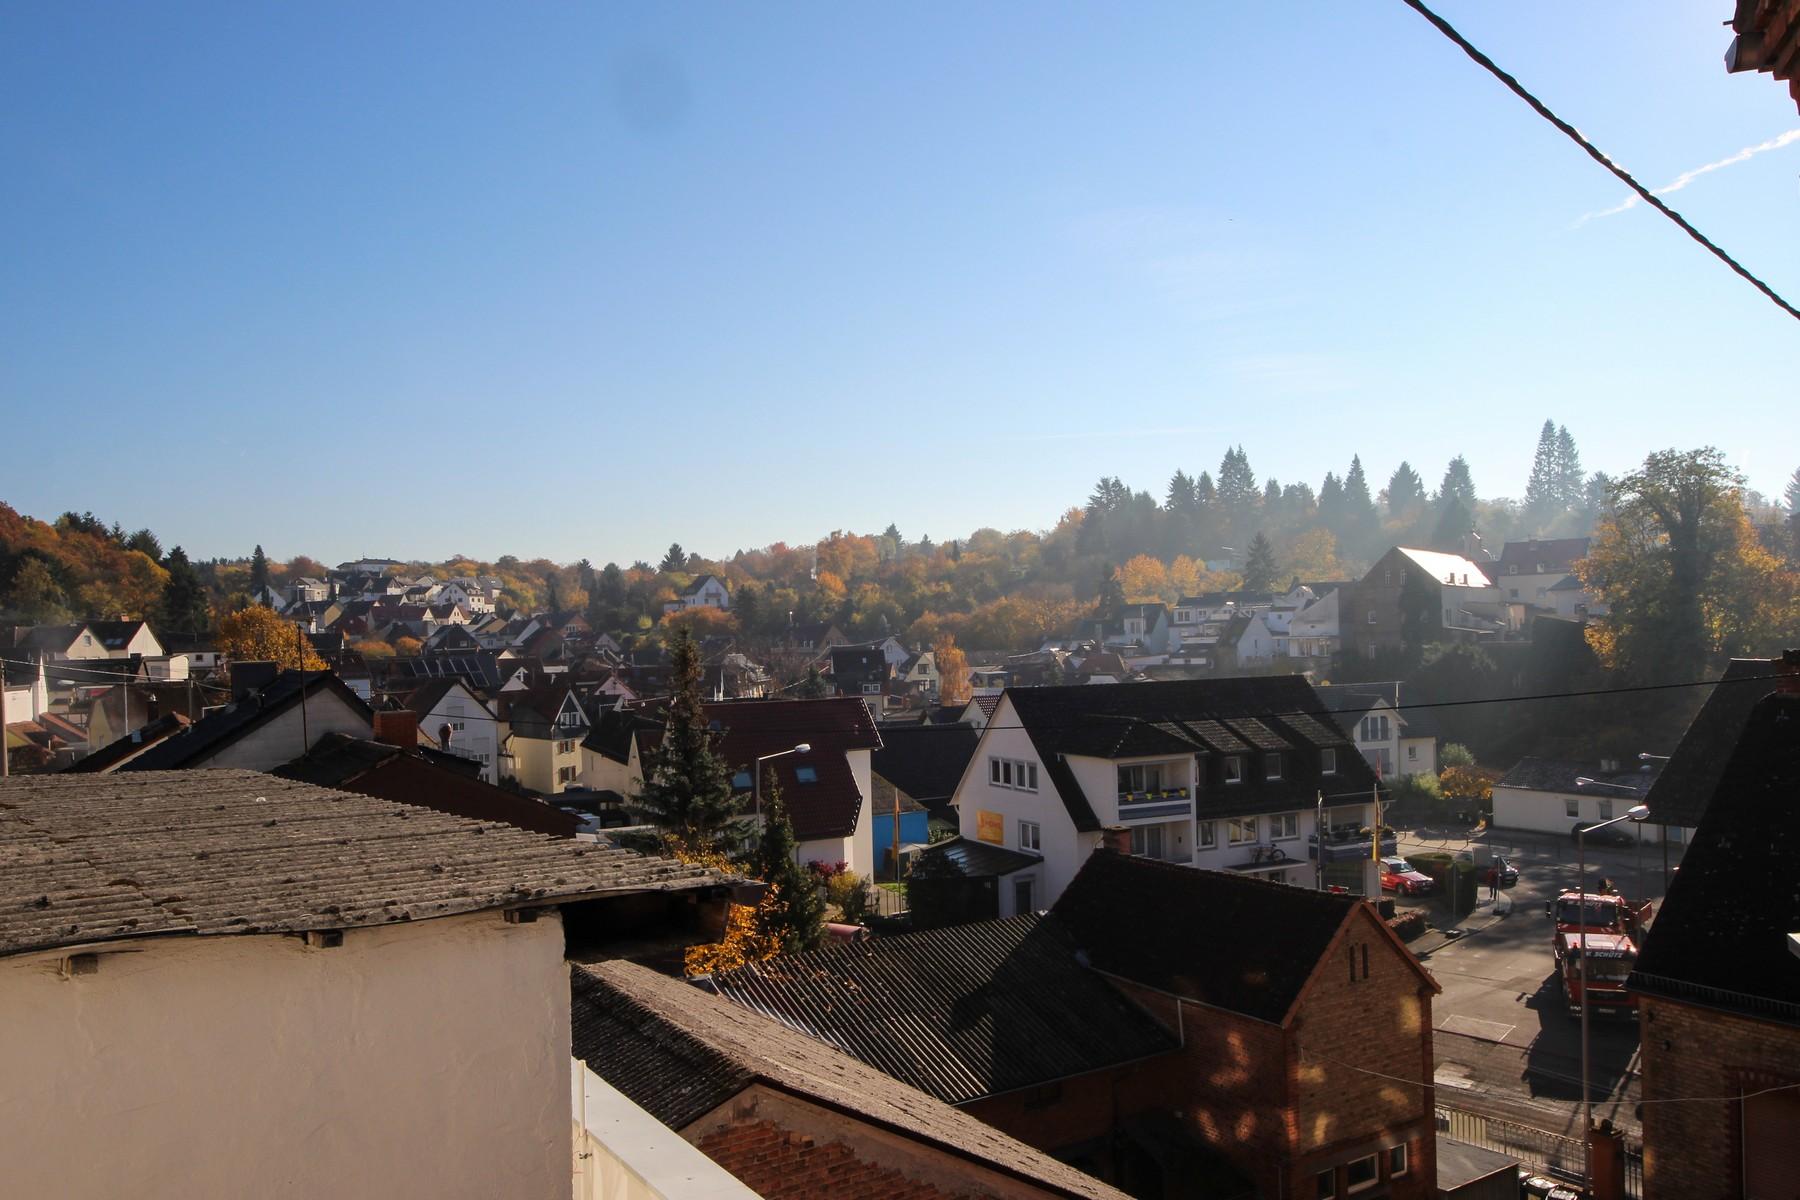 sales property at Wiesbaden-Rambach: House and Vacant Land